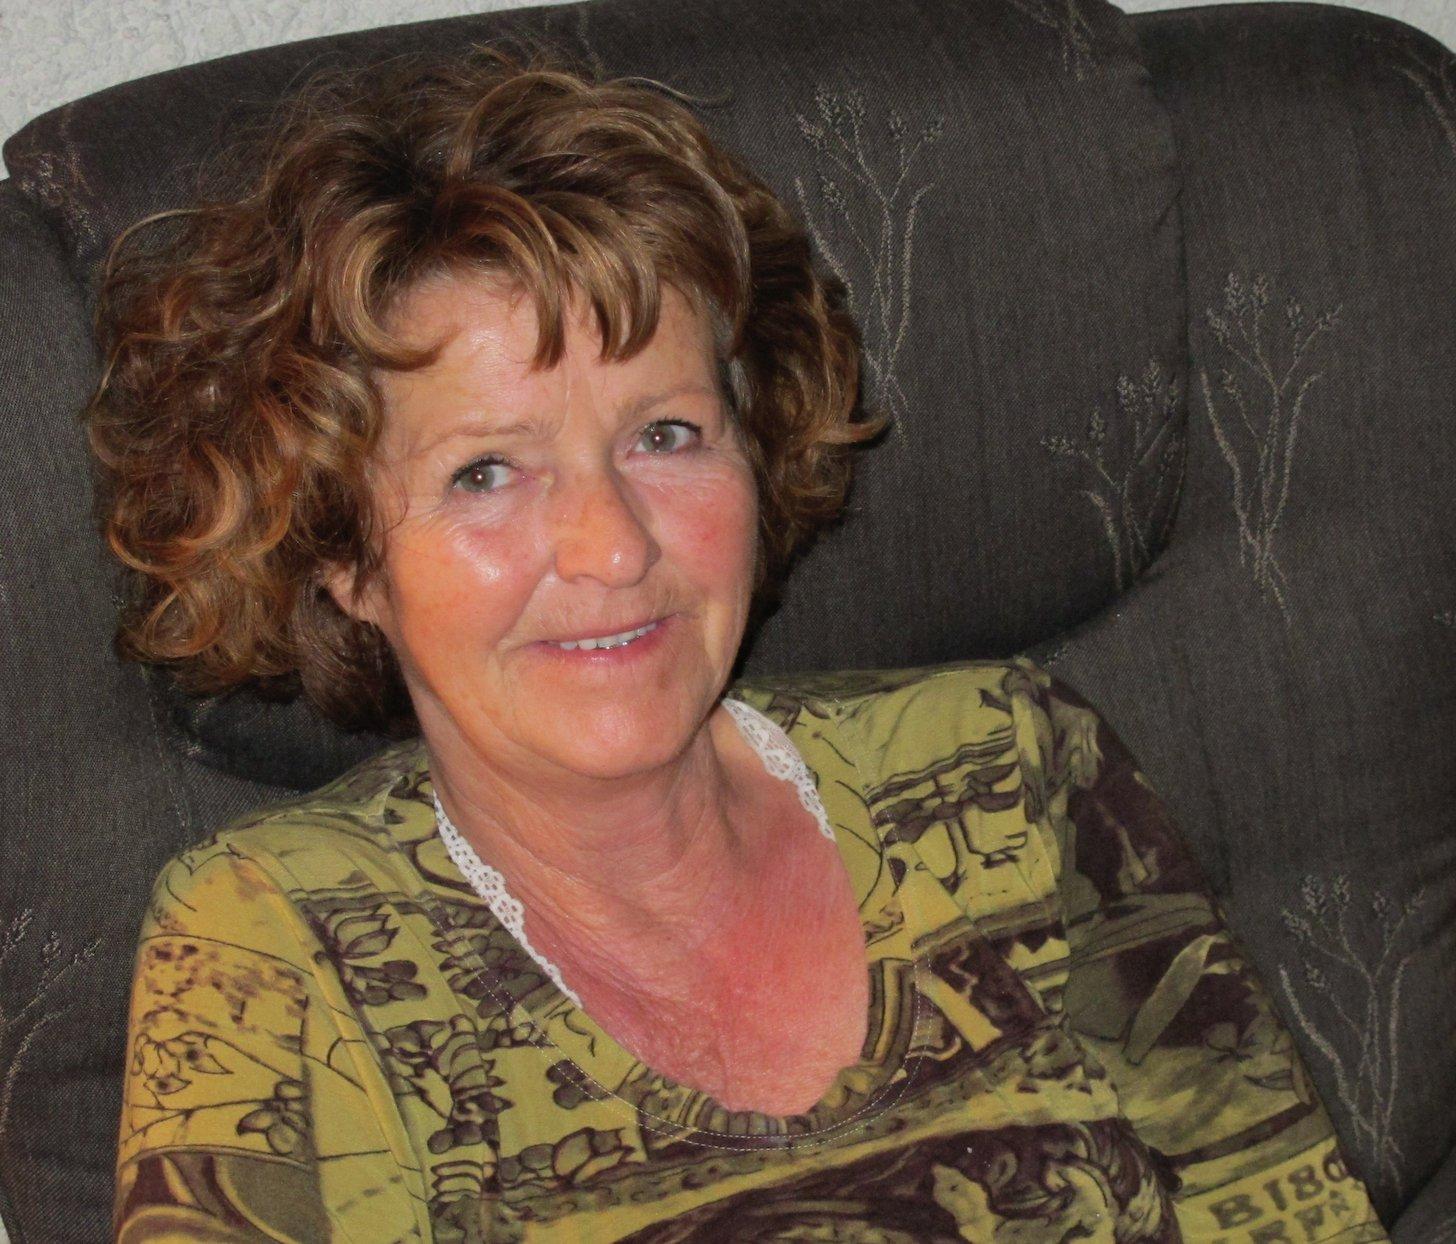 Kidnappers holding wife of Norwegian billionaire for '£8,000,000 ransom'